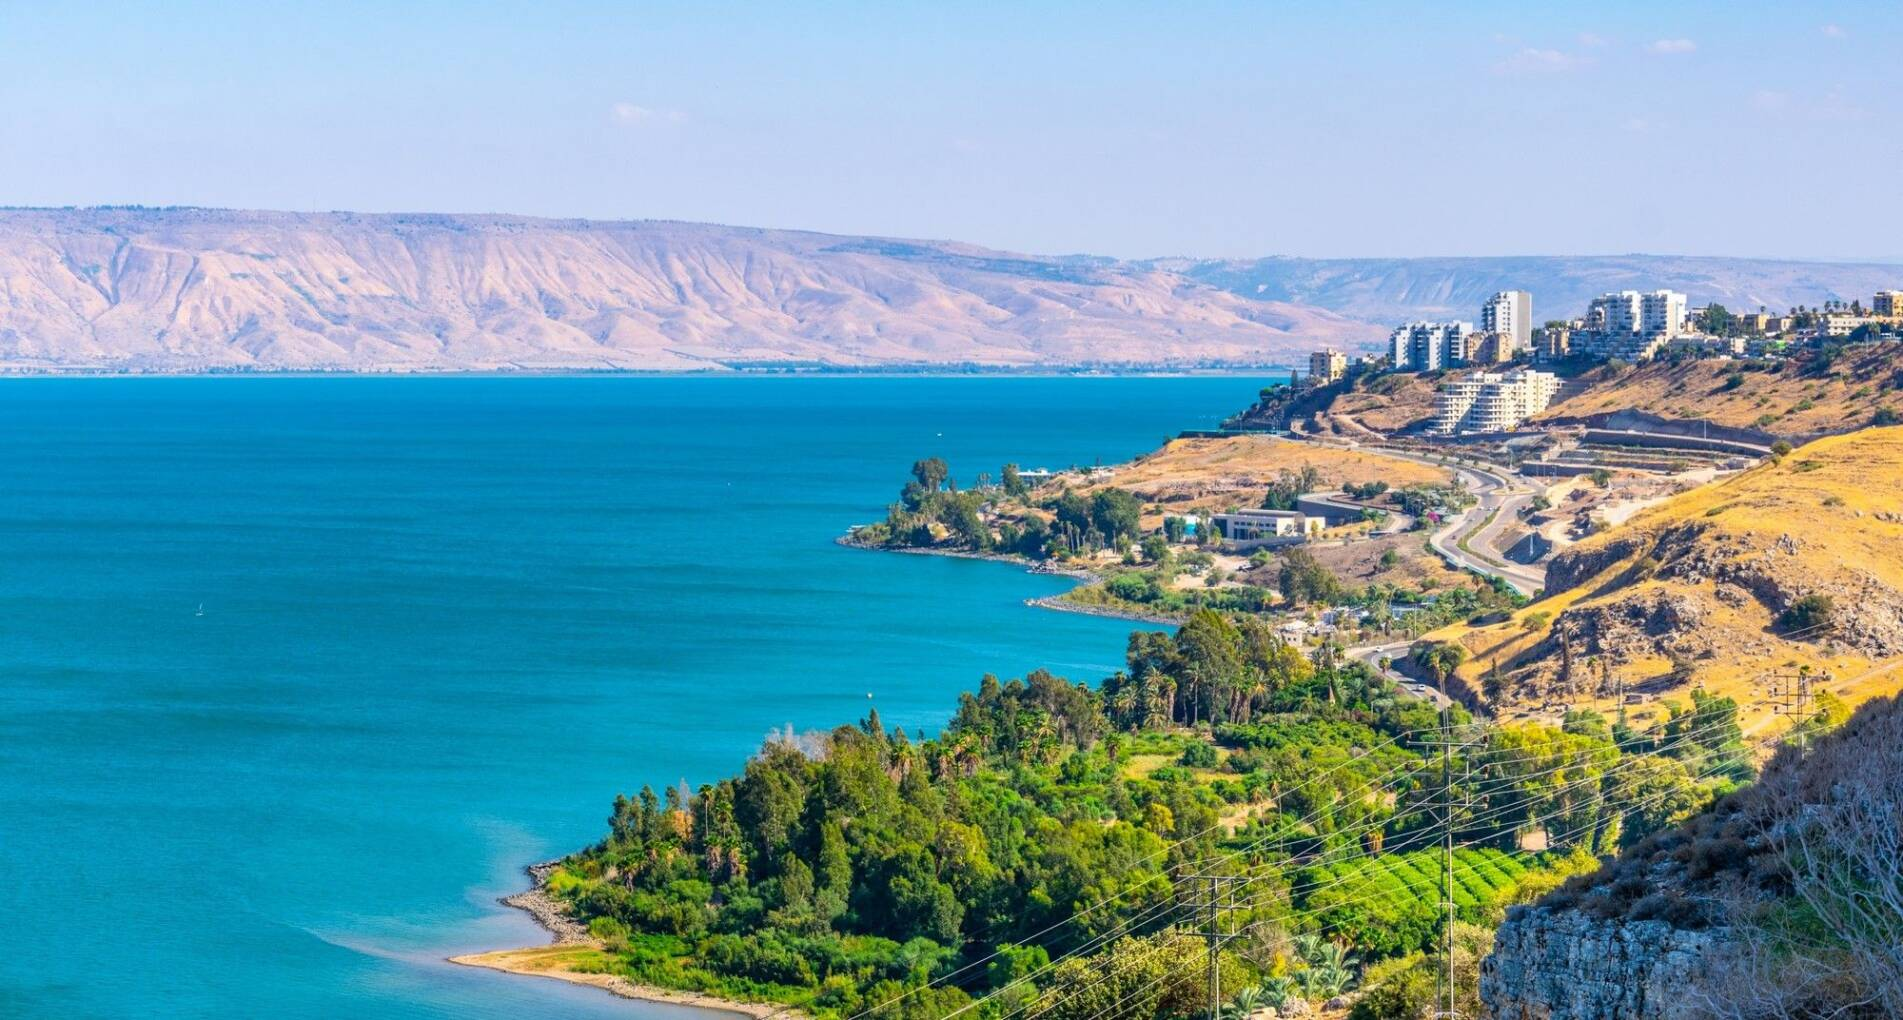 9-daagse rondreis Israël o.l.v. Ds. J.H. Lammers - Israel - 1